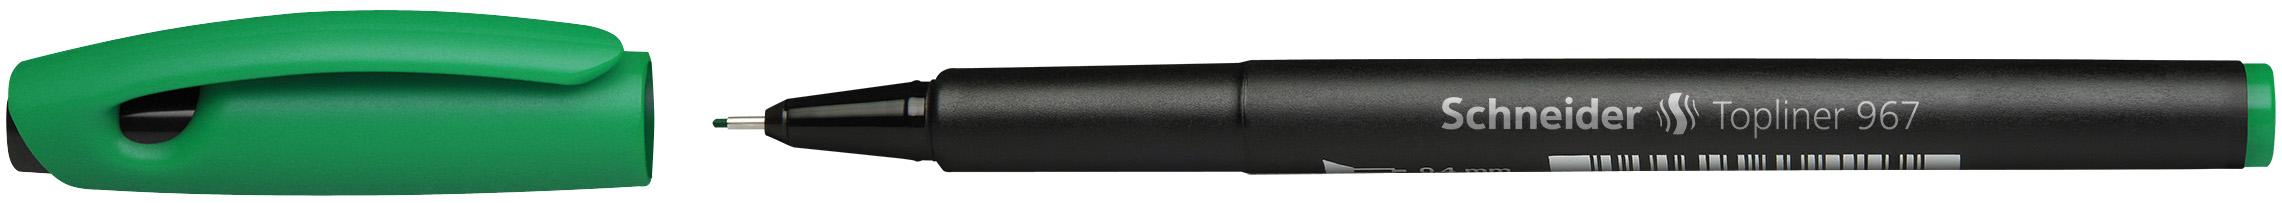 Ручка капиллярная Schneider Topliner 967 зеленая корпус черный 0.4мм